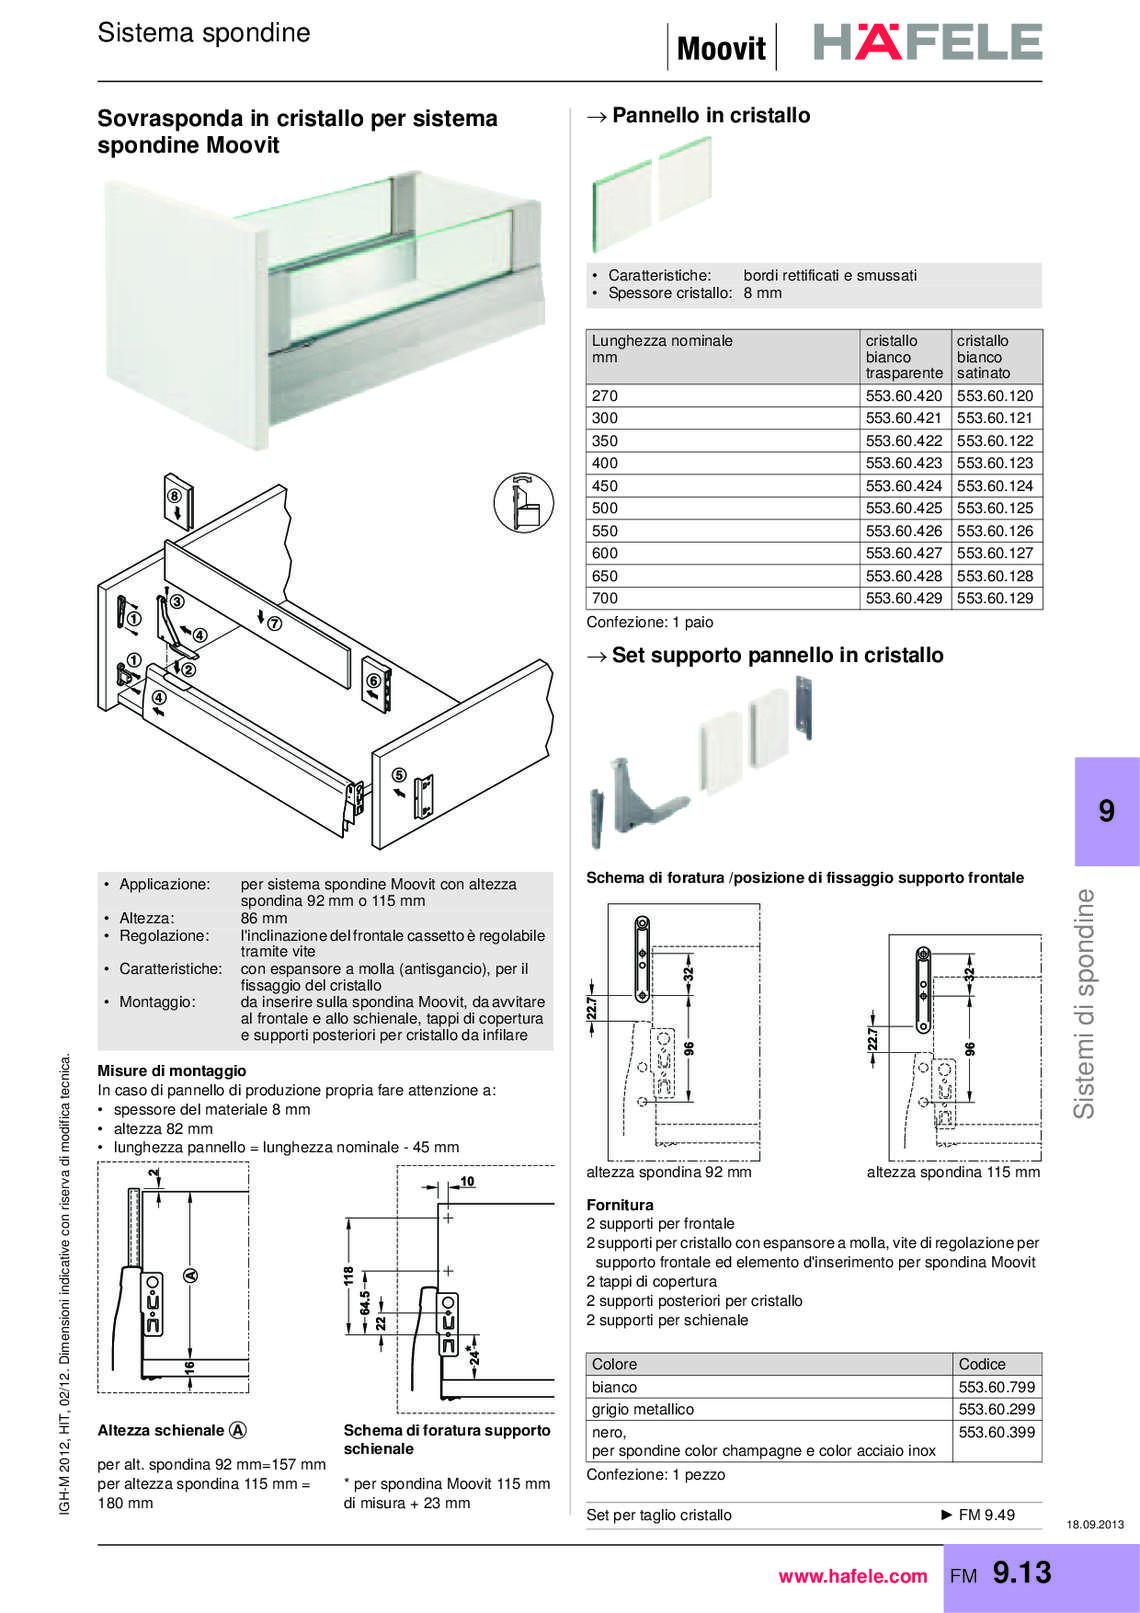 hafele-spondine-e-guide-per-mobili_40_026.jpg